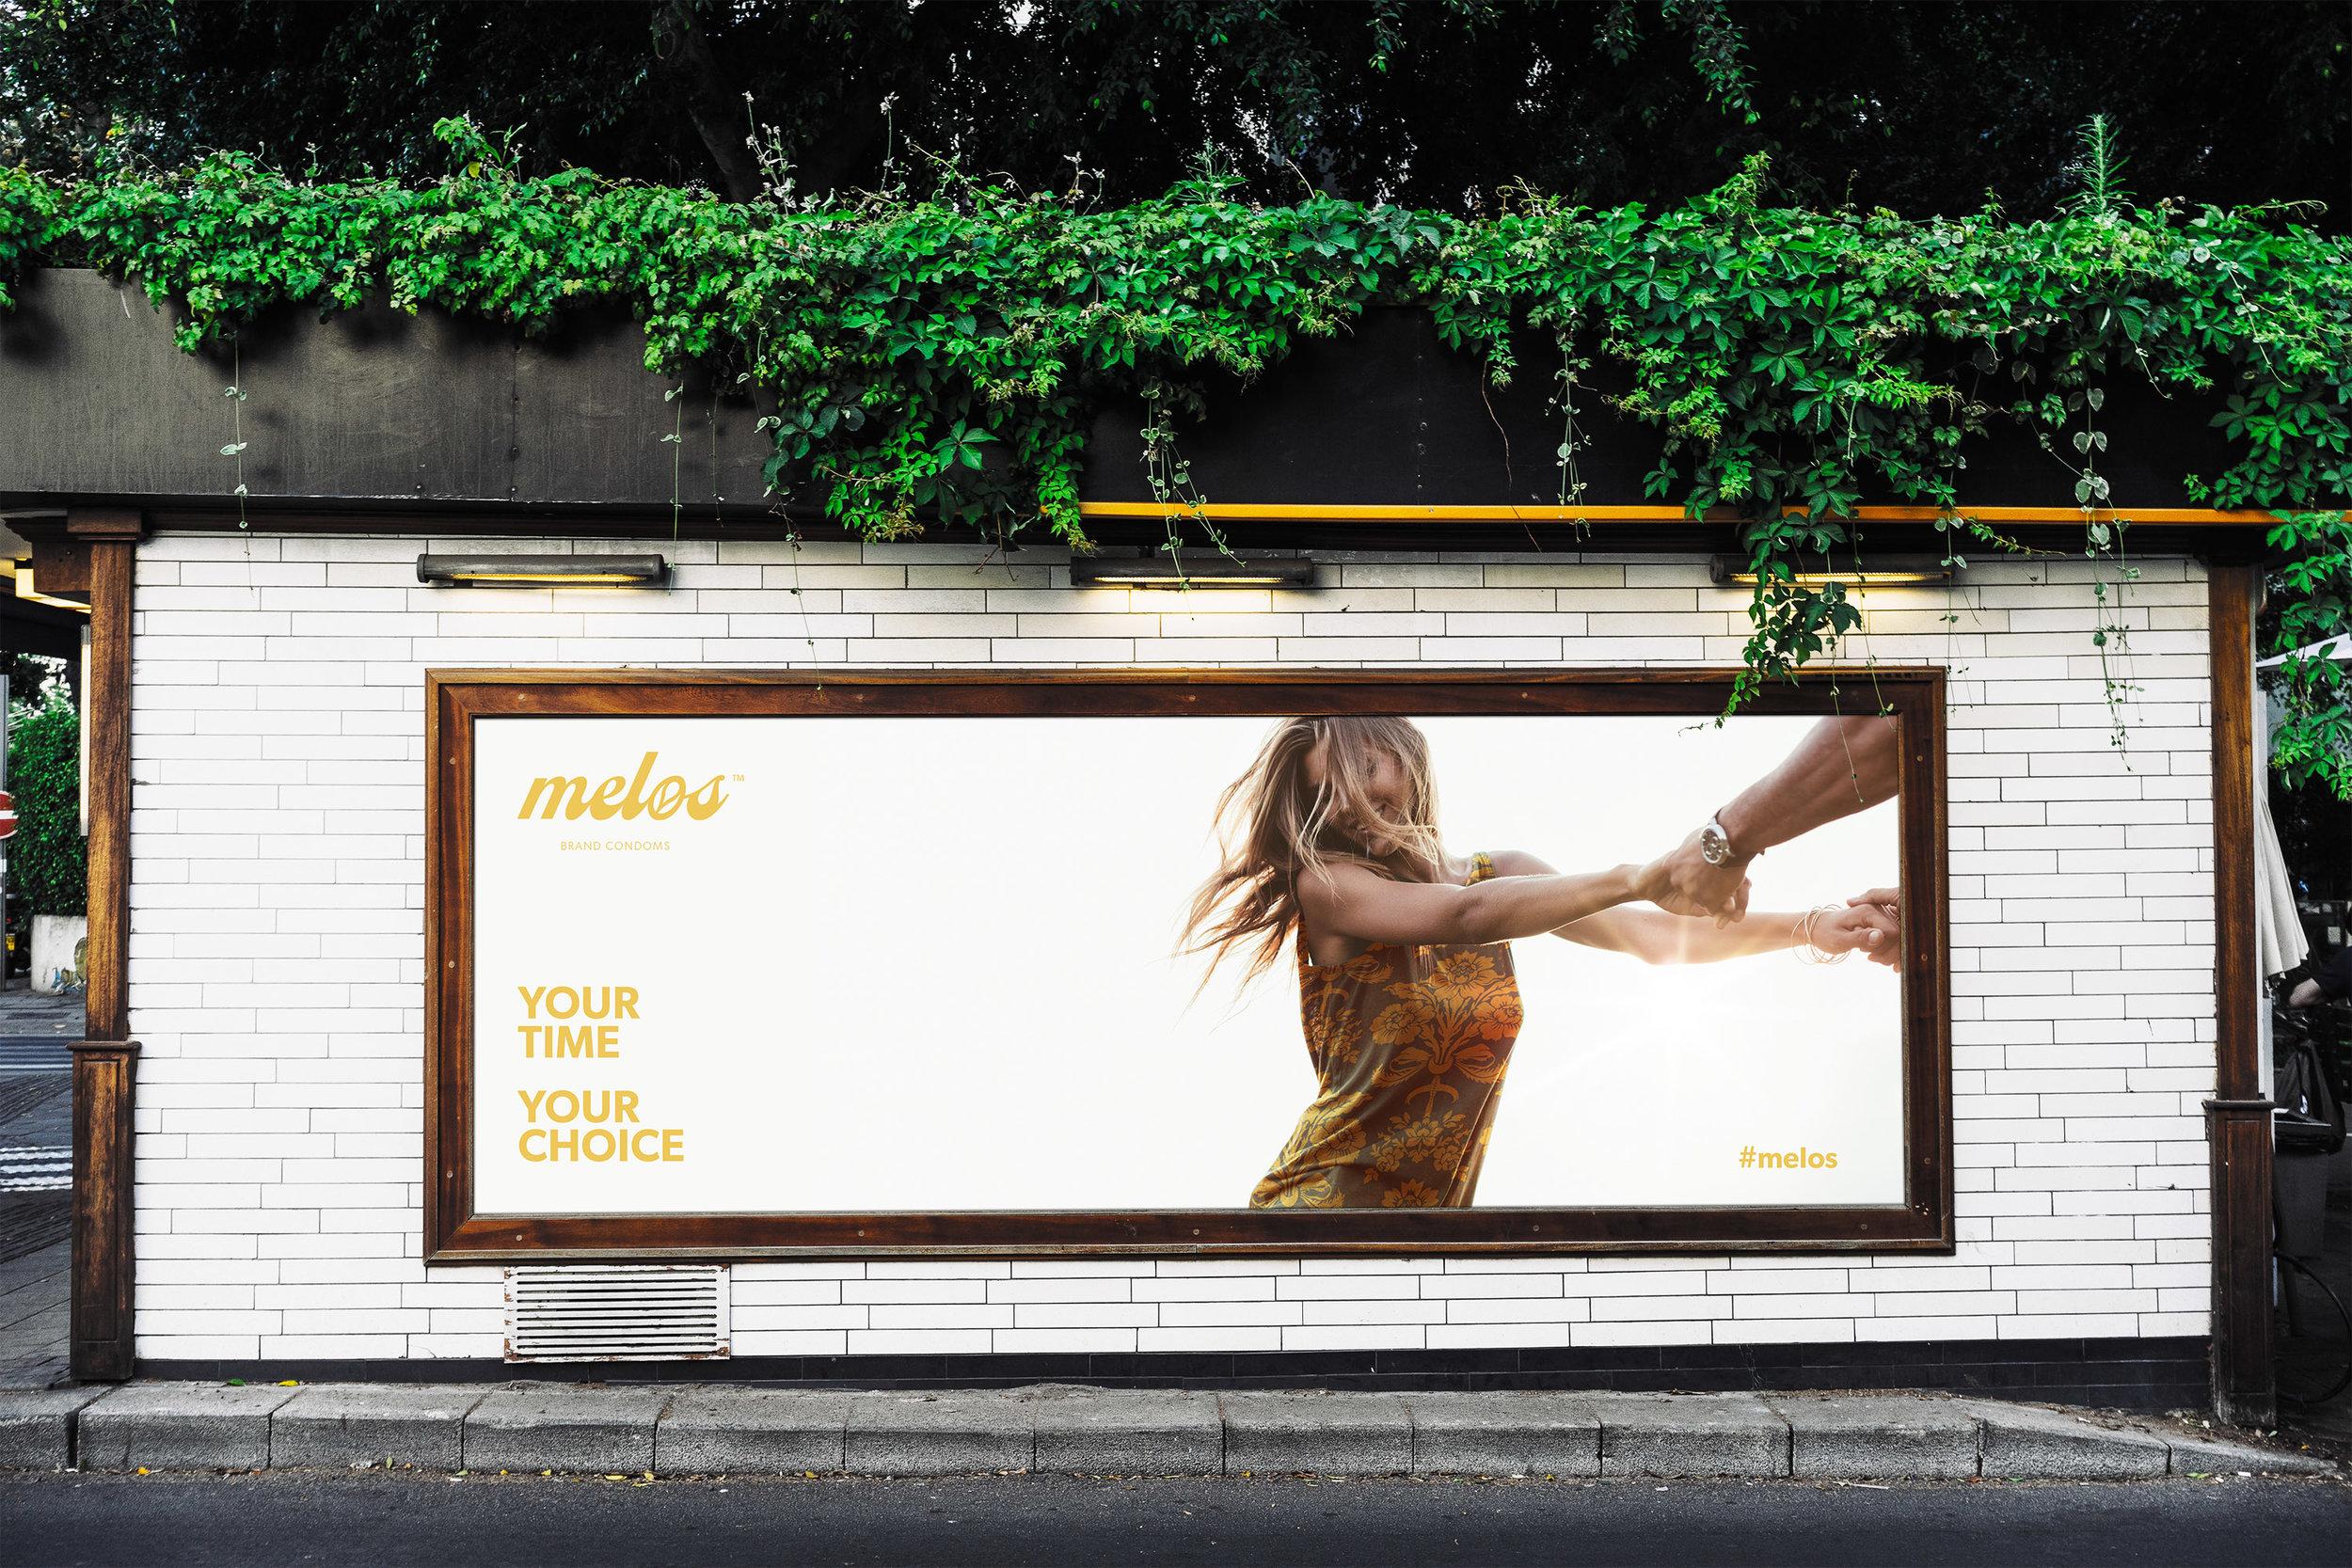 Melos_Street Ad.jpg